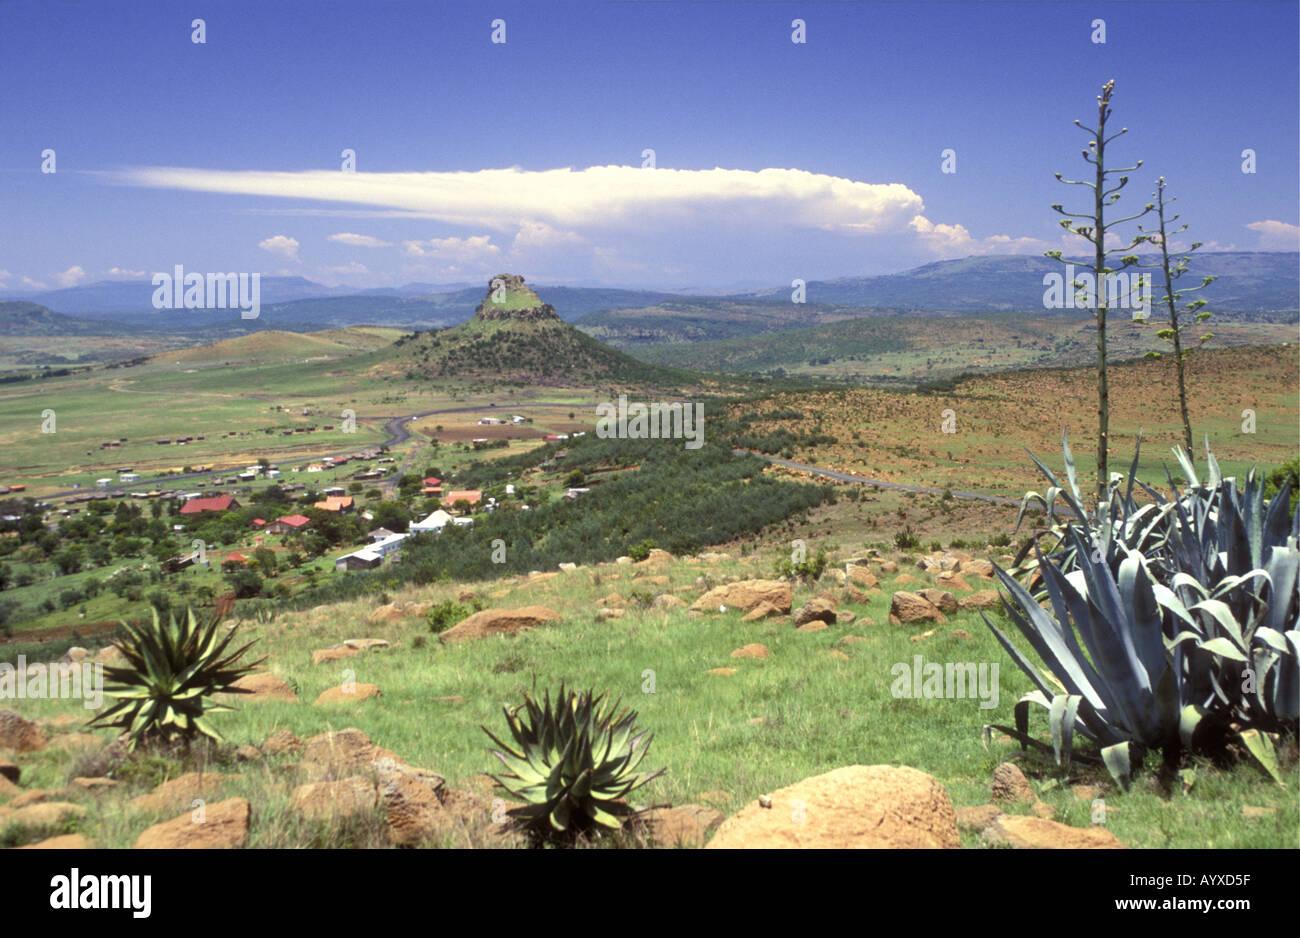 Isandlwana battlefield Natal South Africa - Stock Image